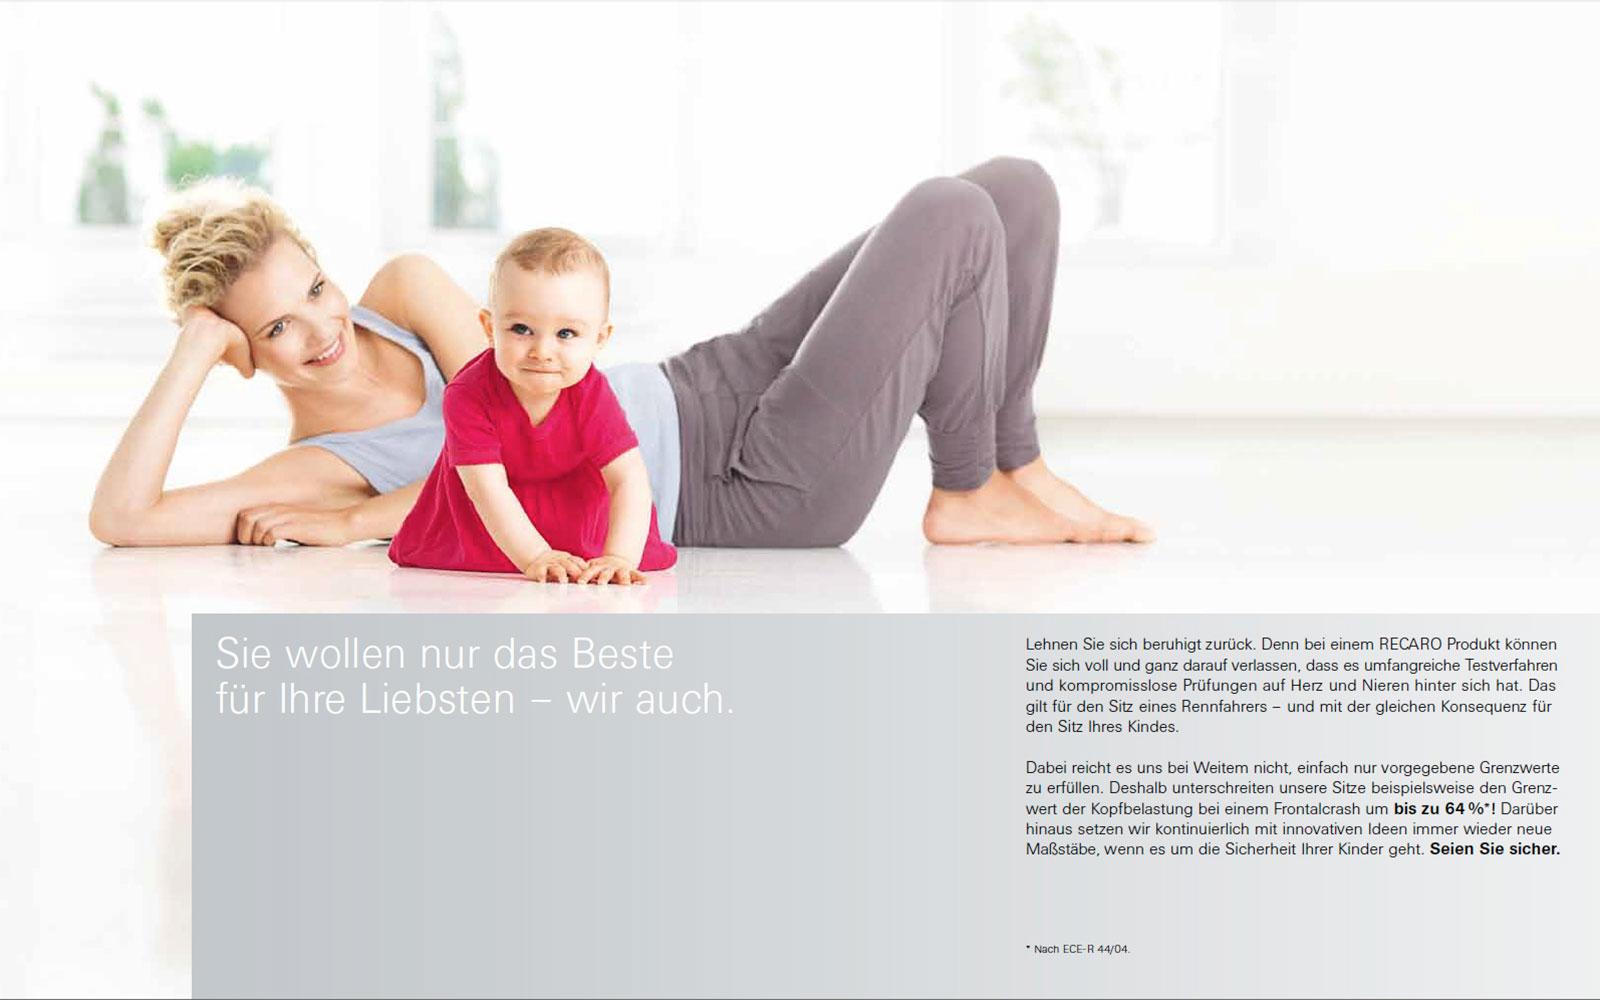 Annette-Grewe-Styling-Top-Agence-Düsseldorf